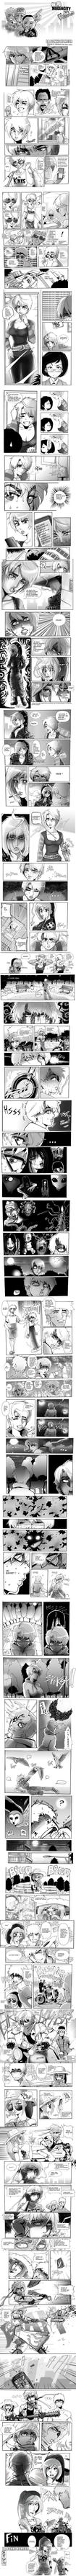 Mugen City Episode - LA BONNE HUMEUR by MaKuZoKu